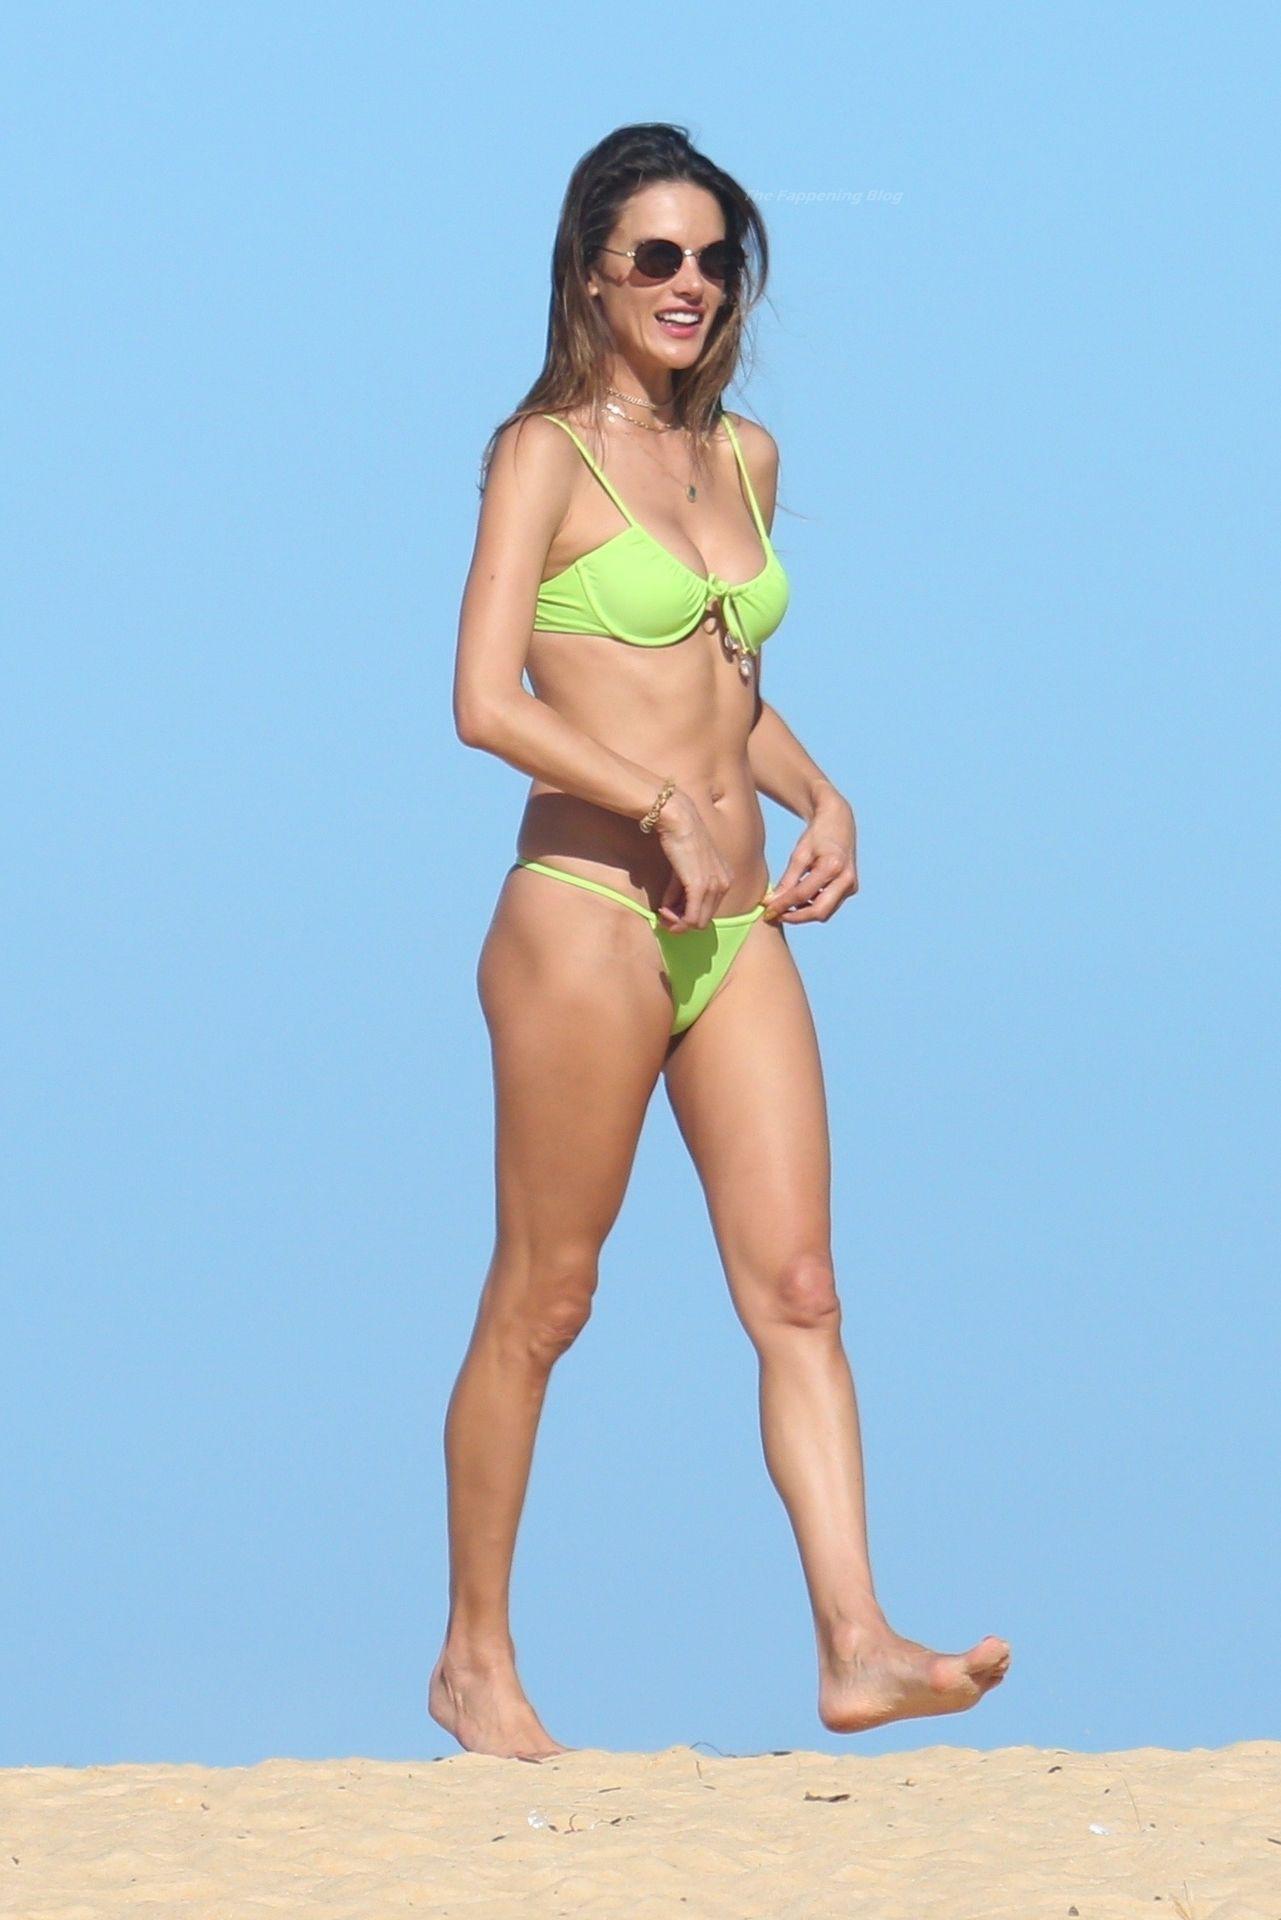 Alessandra-Ambrosio-Sexy-The-Fappening-Blog-831.jpg